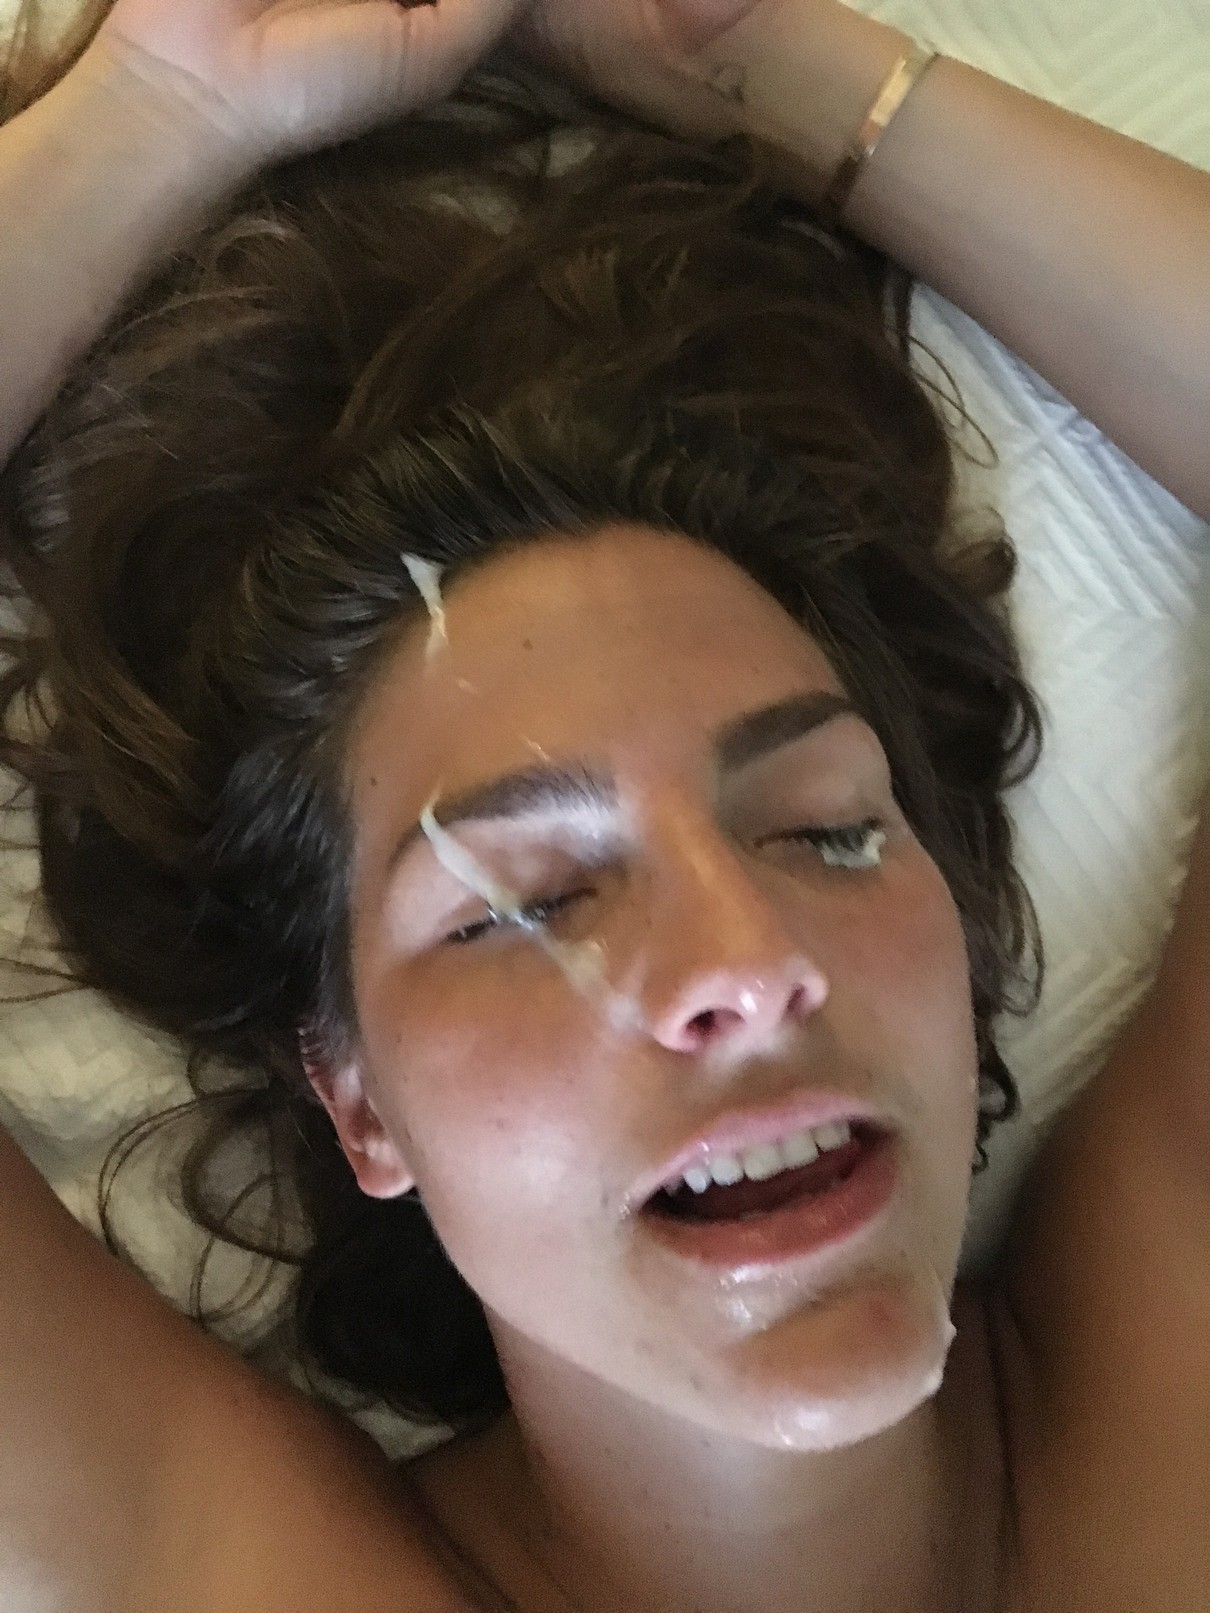 celebrity sex tape cumshots